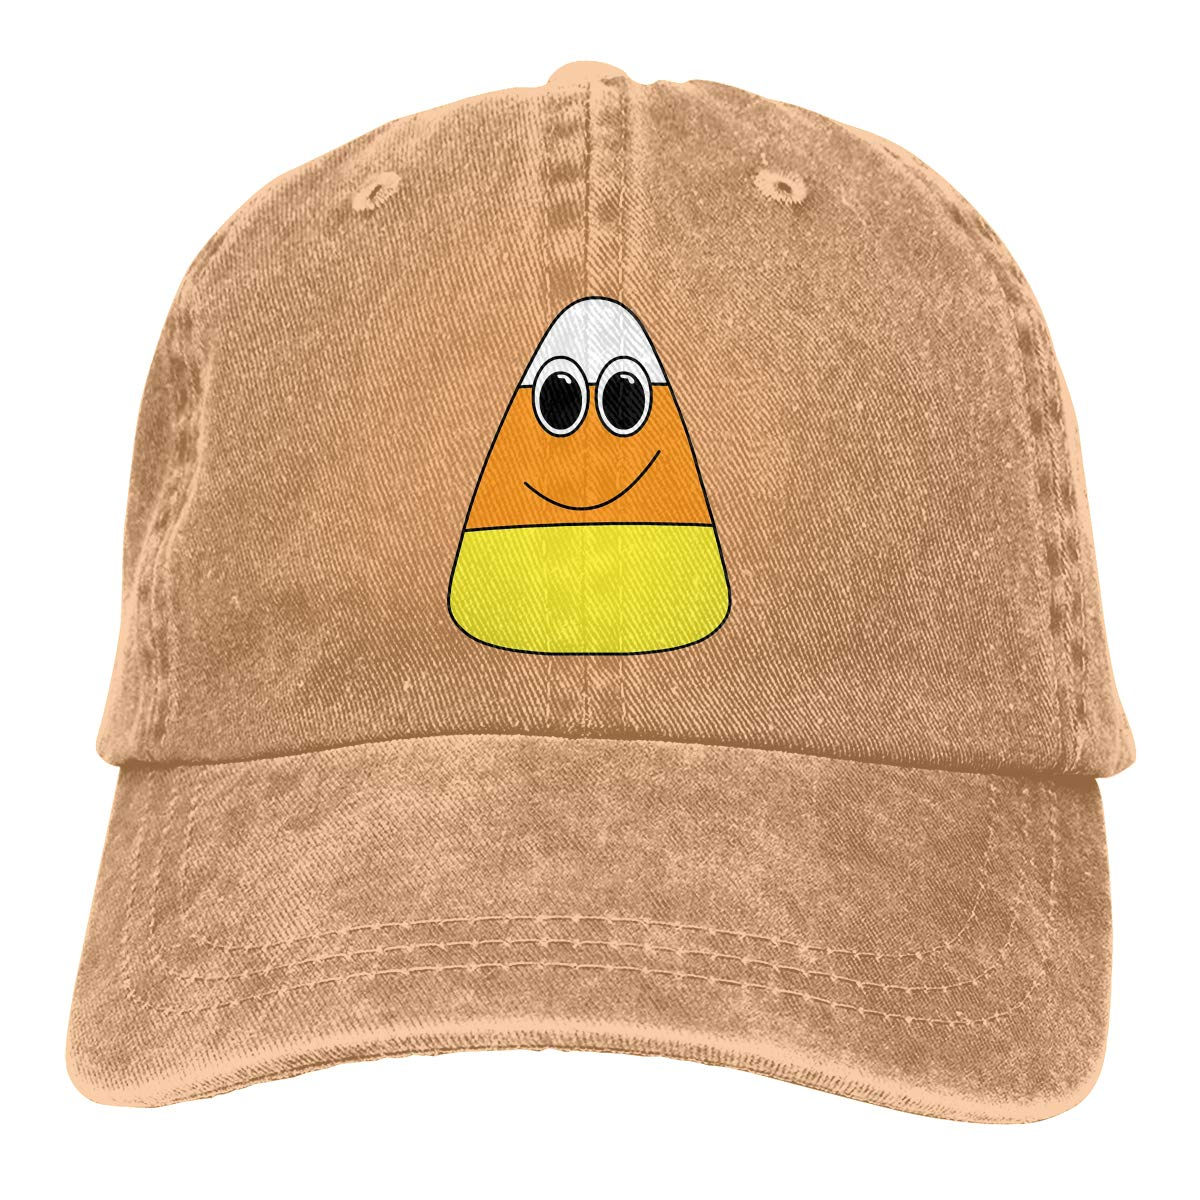 Qbeir Adult Unisex Cowboy Cap Adjustable Hat Cute Animated Candy Cotton Denim